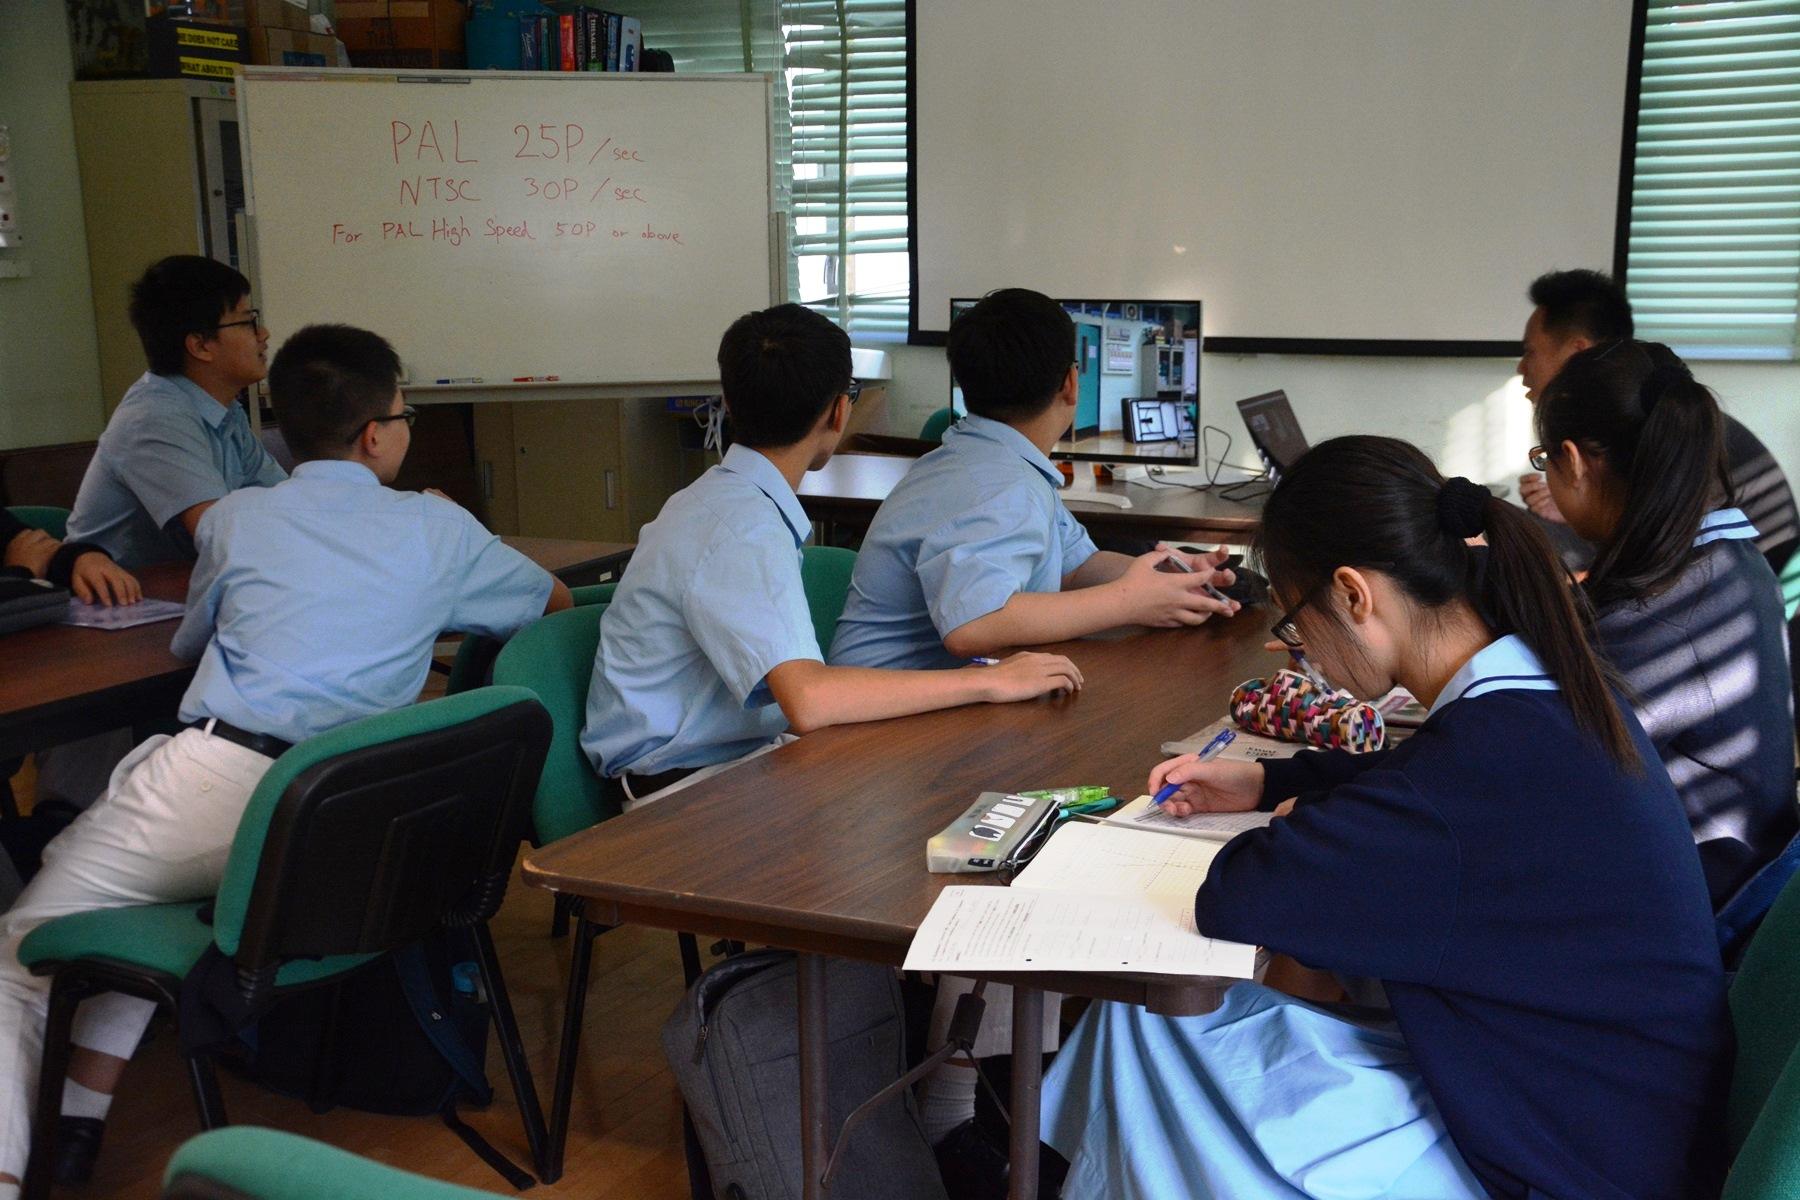 http://www.npc.edu.hk/sites/default/files/dsc_7304.jpg